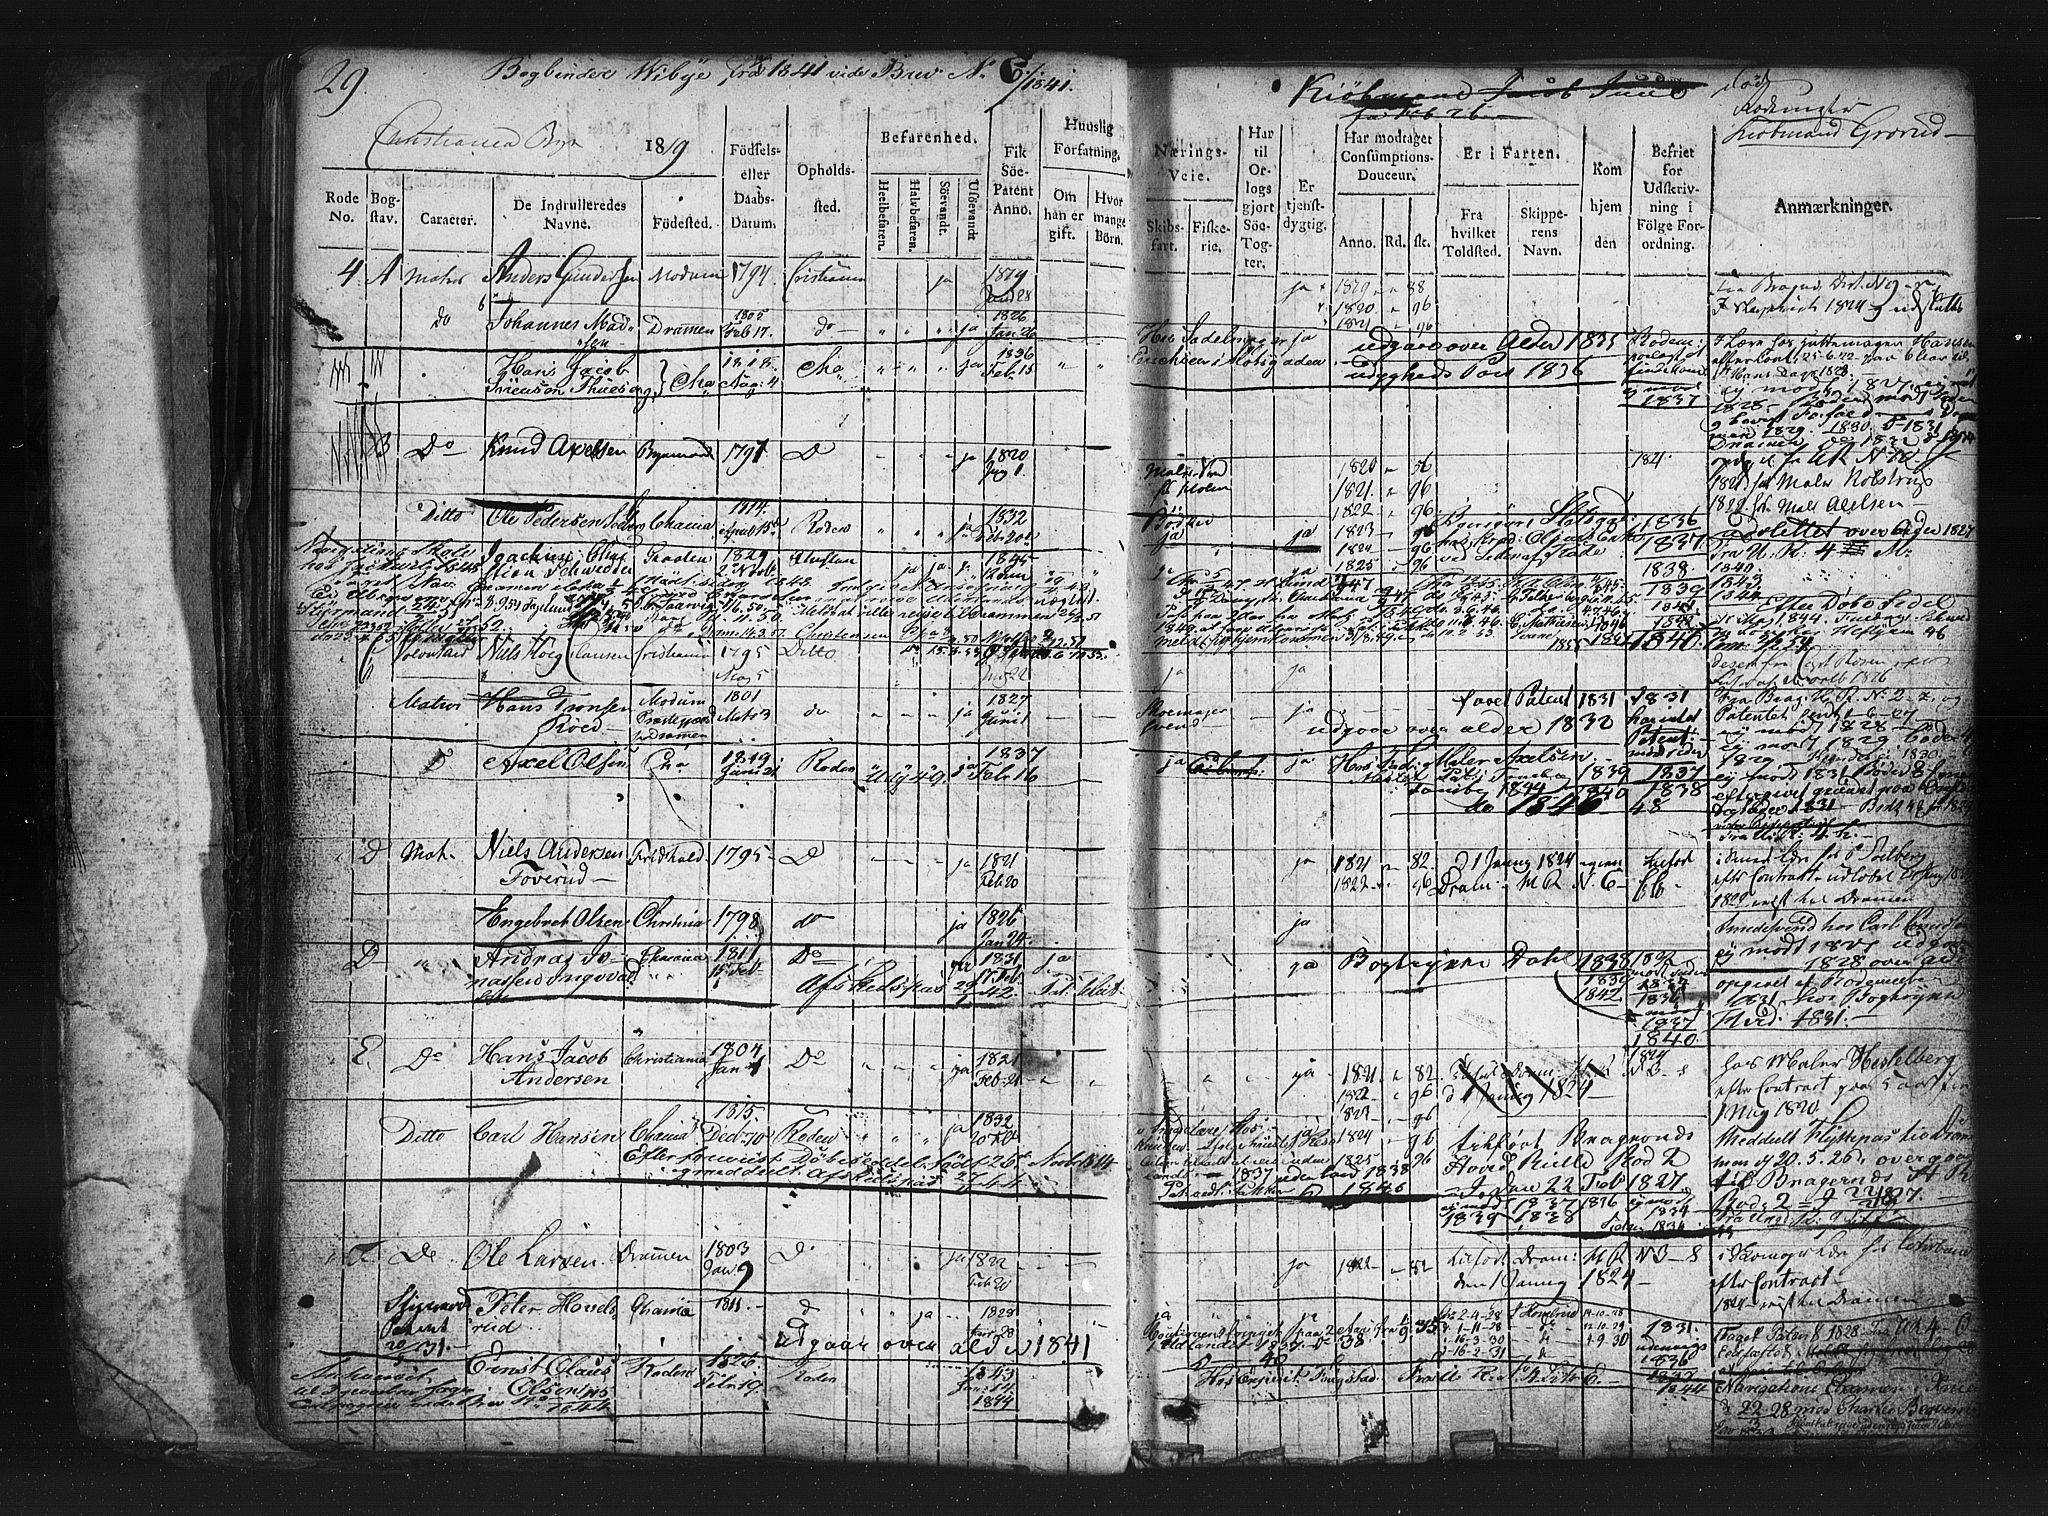 SAO, Oslo mønstringskontor, F/Fc/Fcb/L0001: Hovedrulle, 1819, s. 29